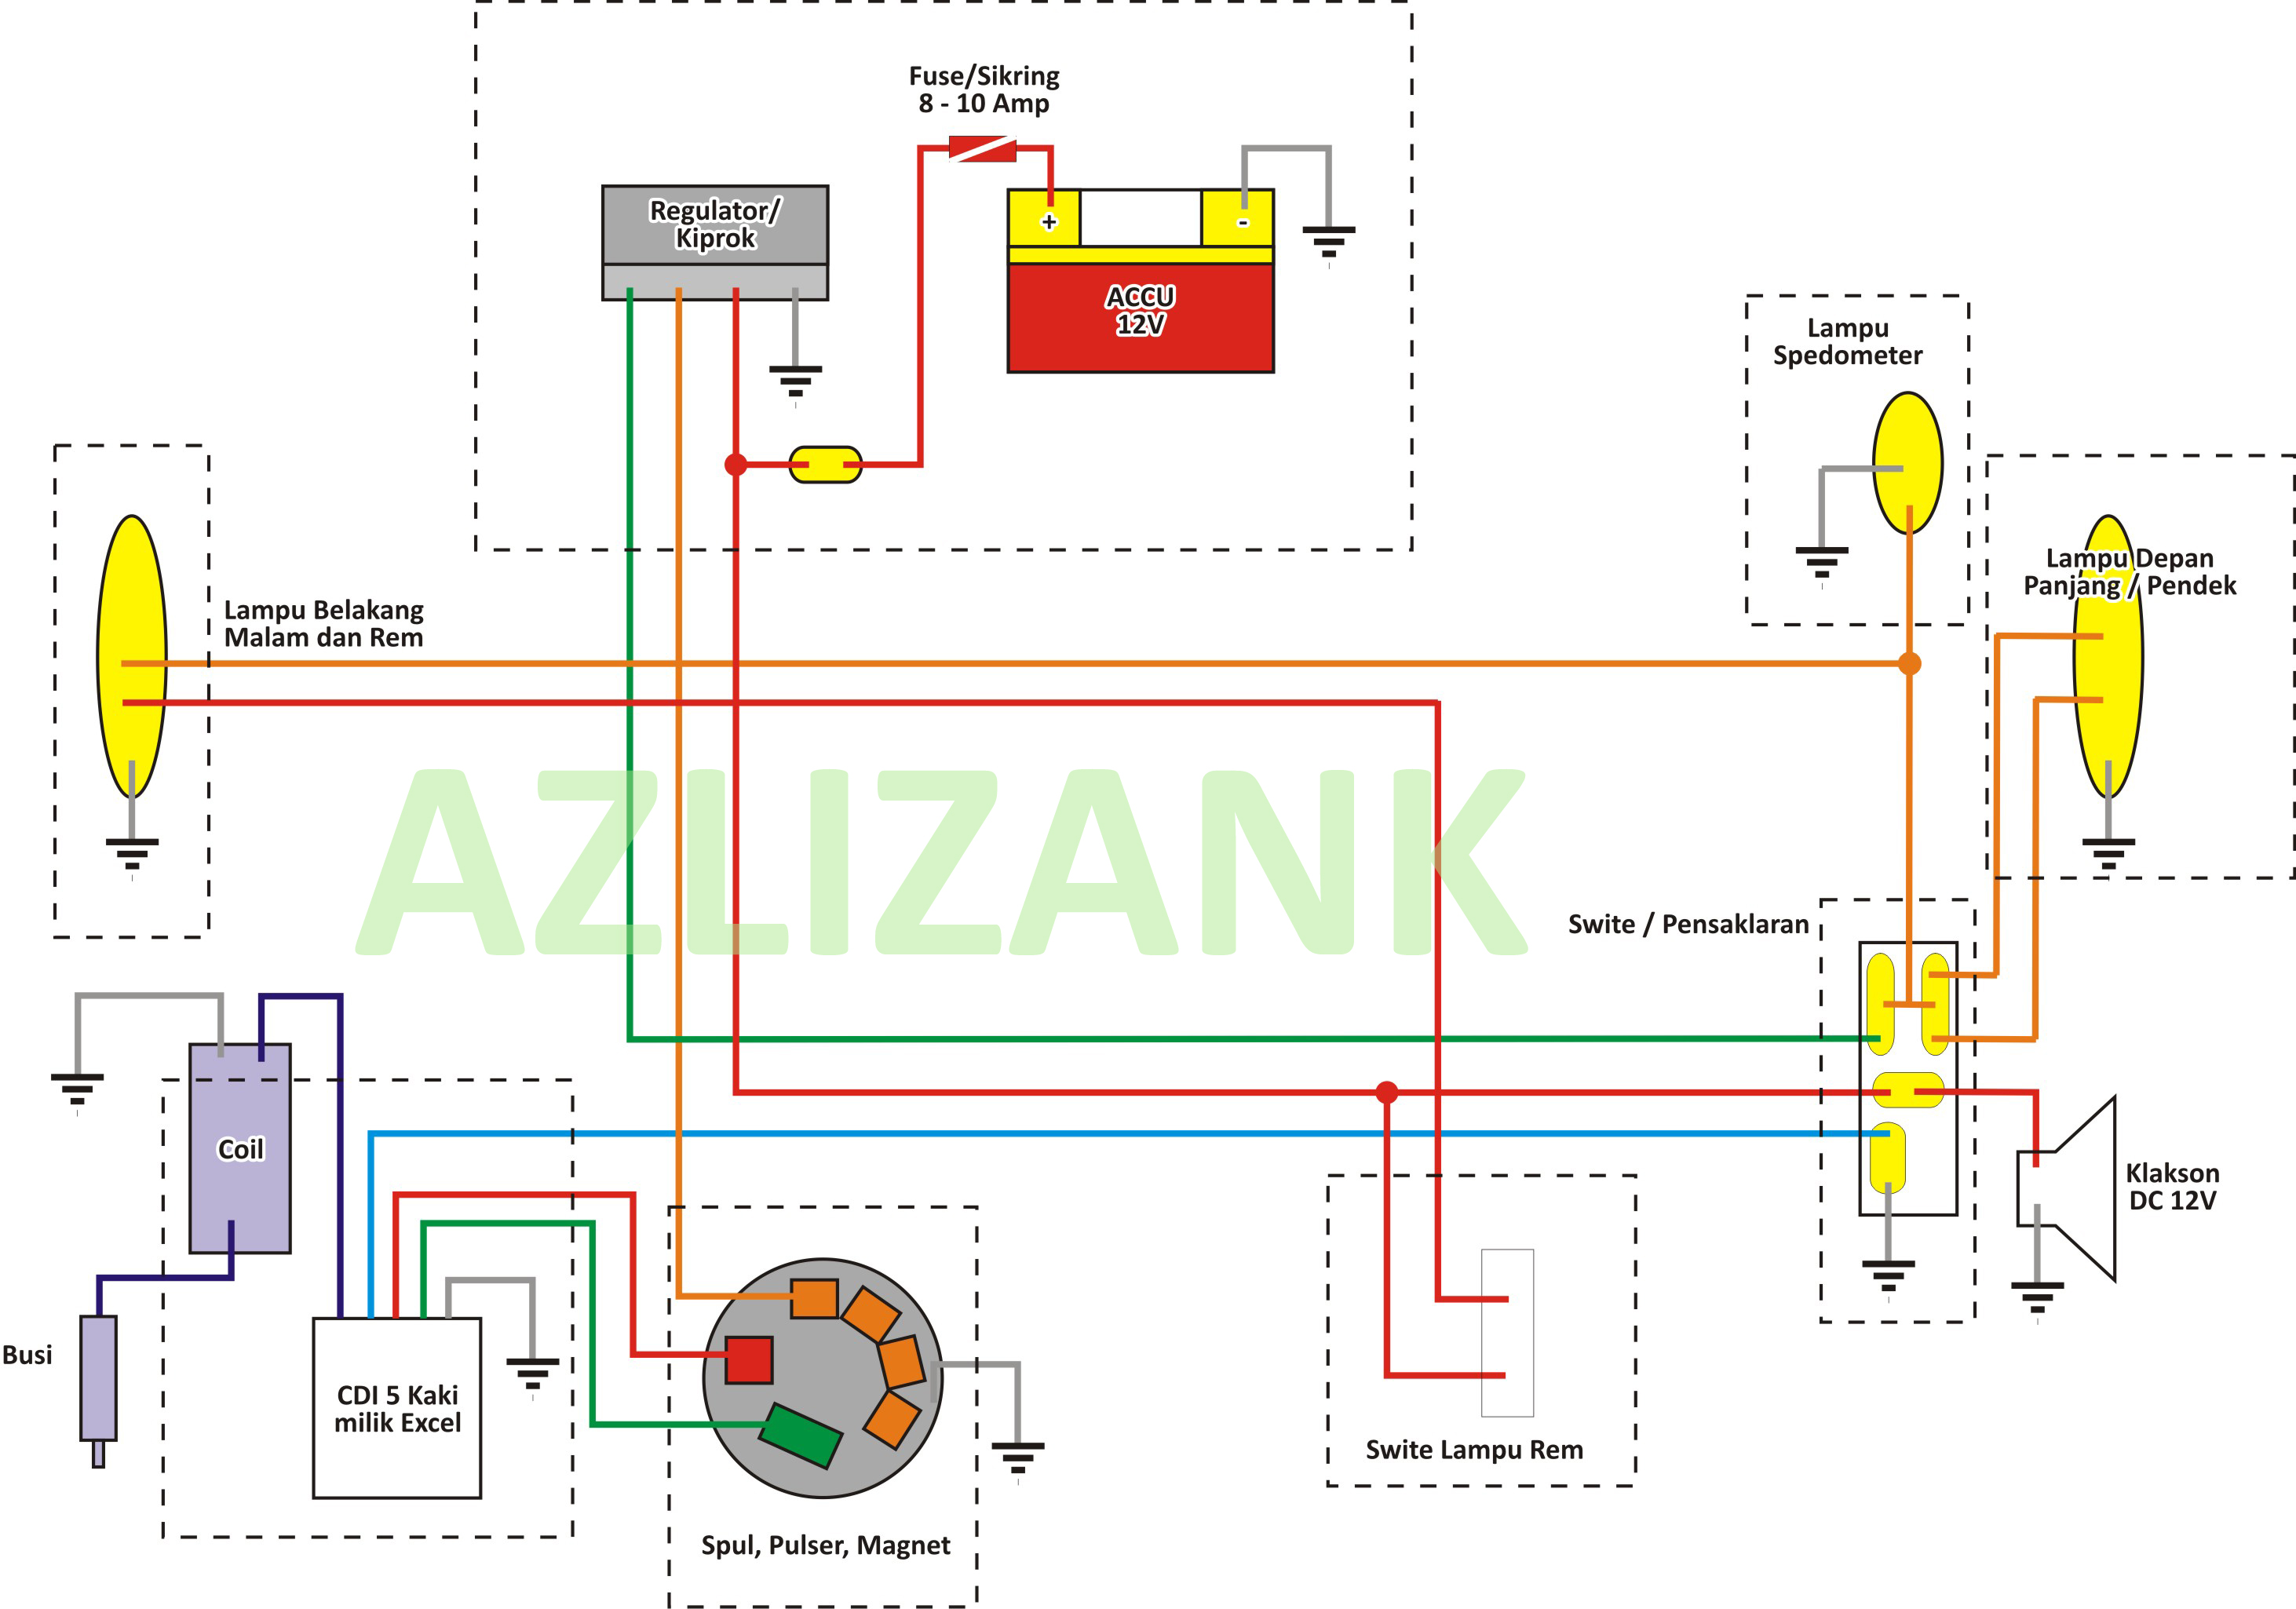 small resolution of vespa vo wiring diagram wiring library tao tao 50cc moped wiring diagram vespa vo moped wiring diagram